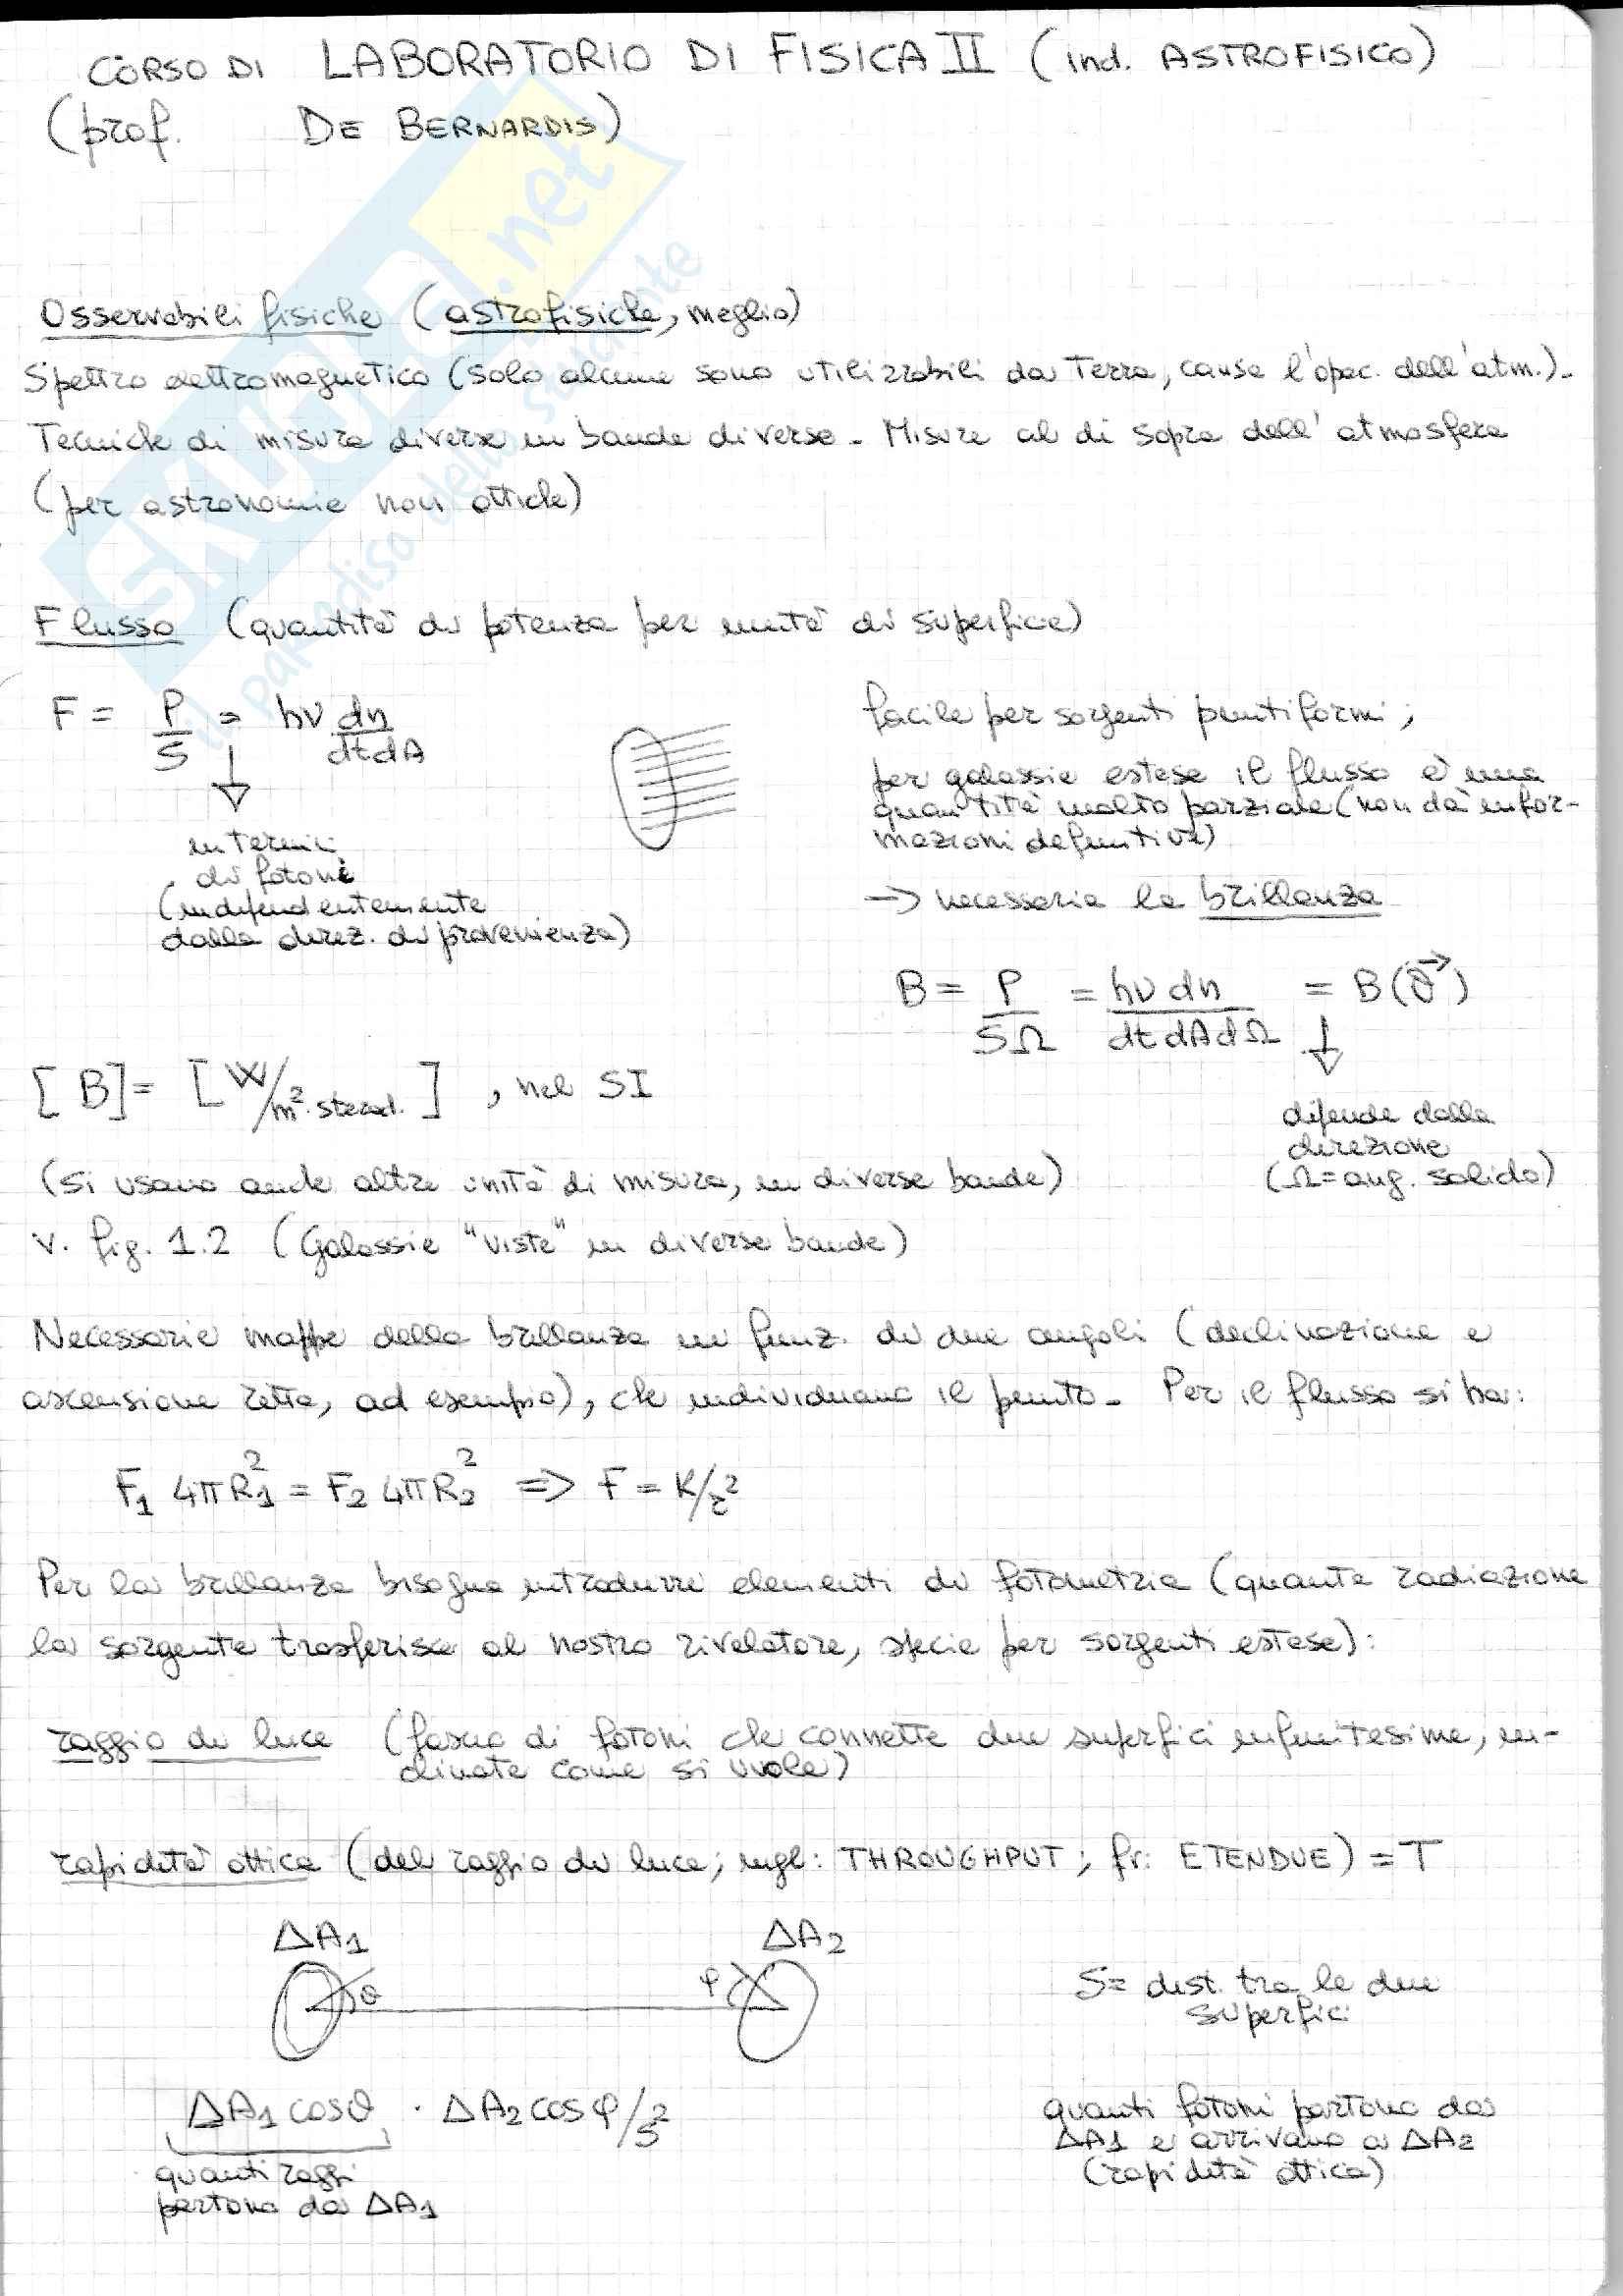 appunto P. De Bernardis Astrofisica